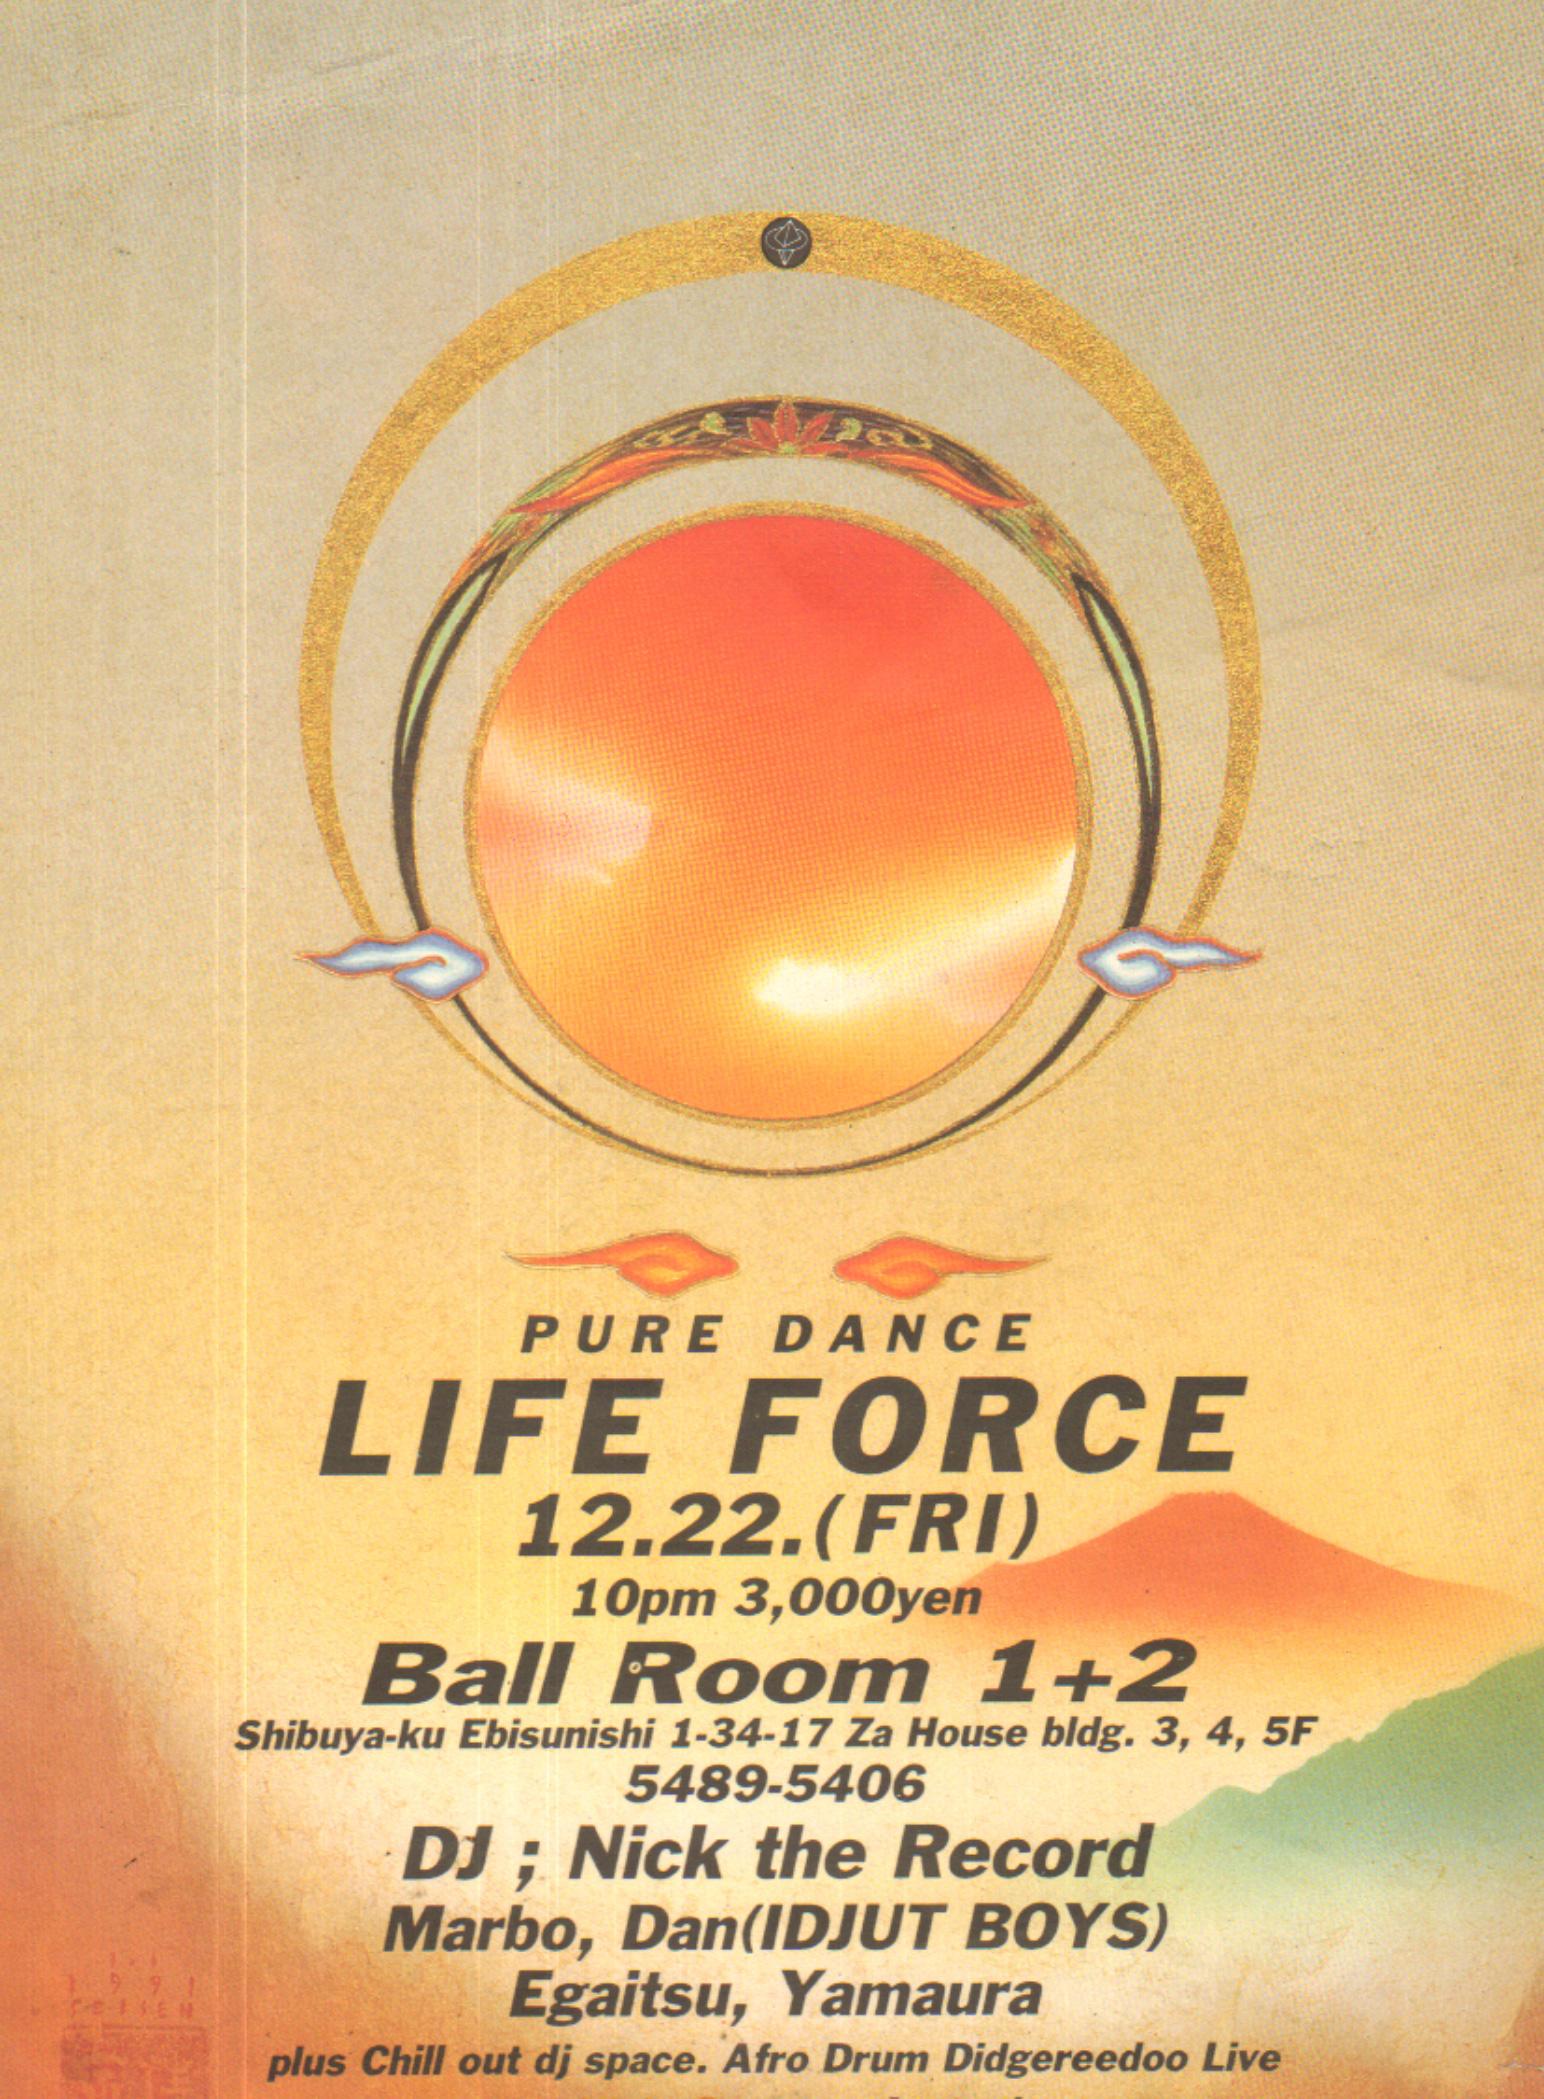 Nick The Record, Lifeforce, Japan, Story, Massa, Clubs, Japanese, Music